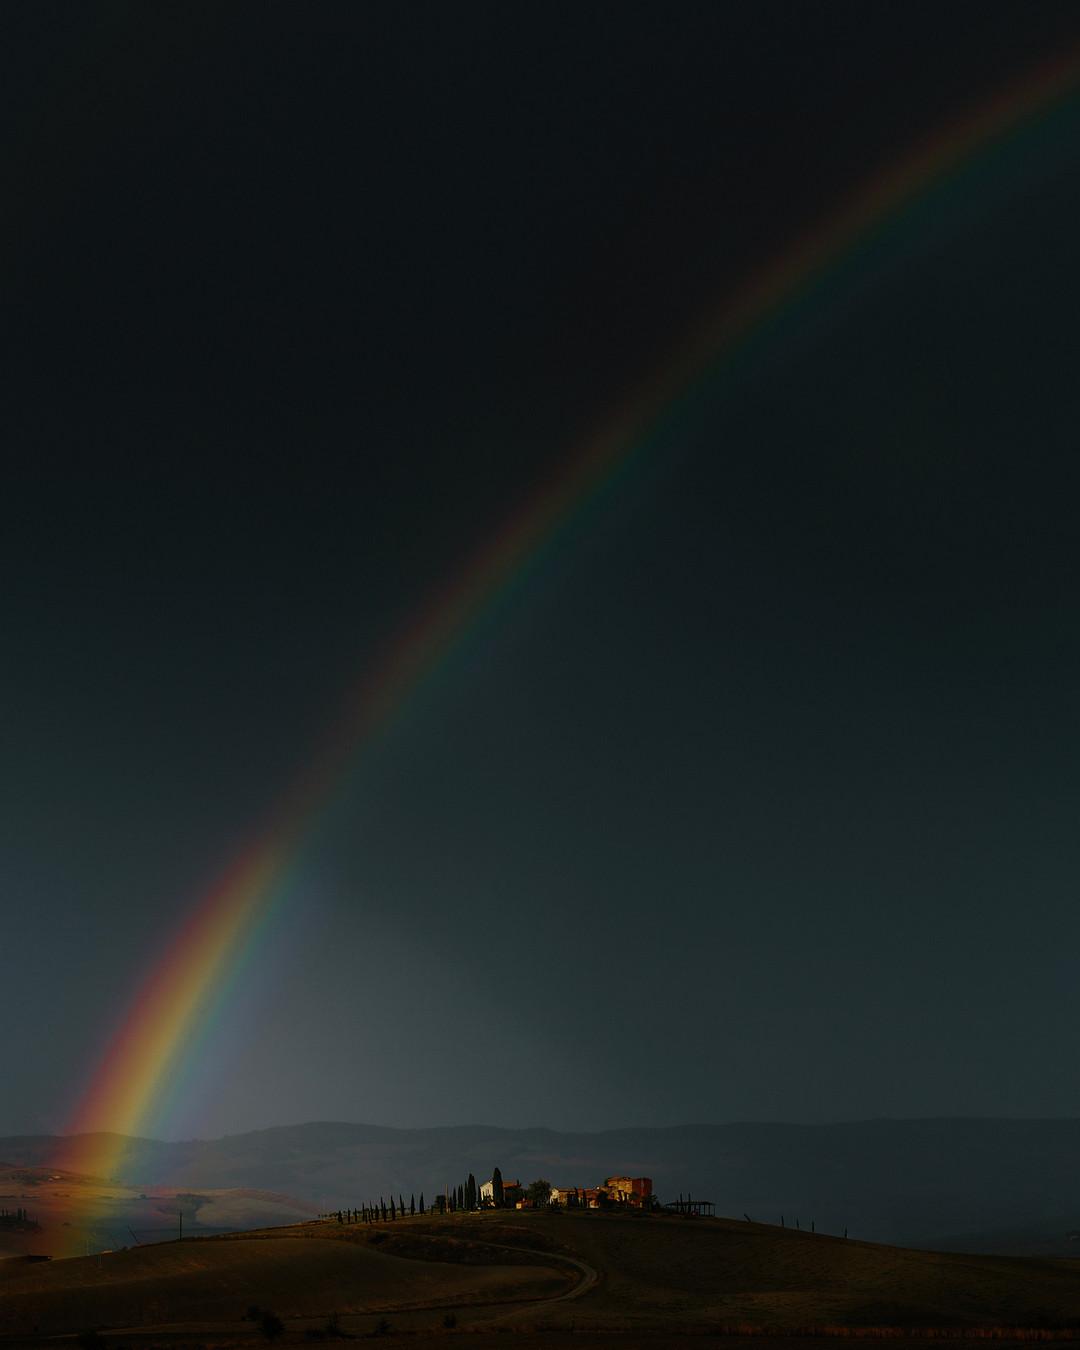 Rainbow over Locanda in Tuscany wedding venue